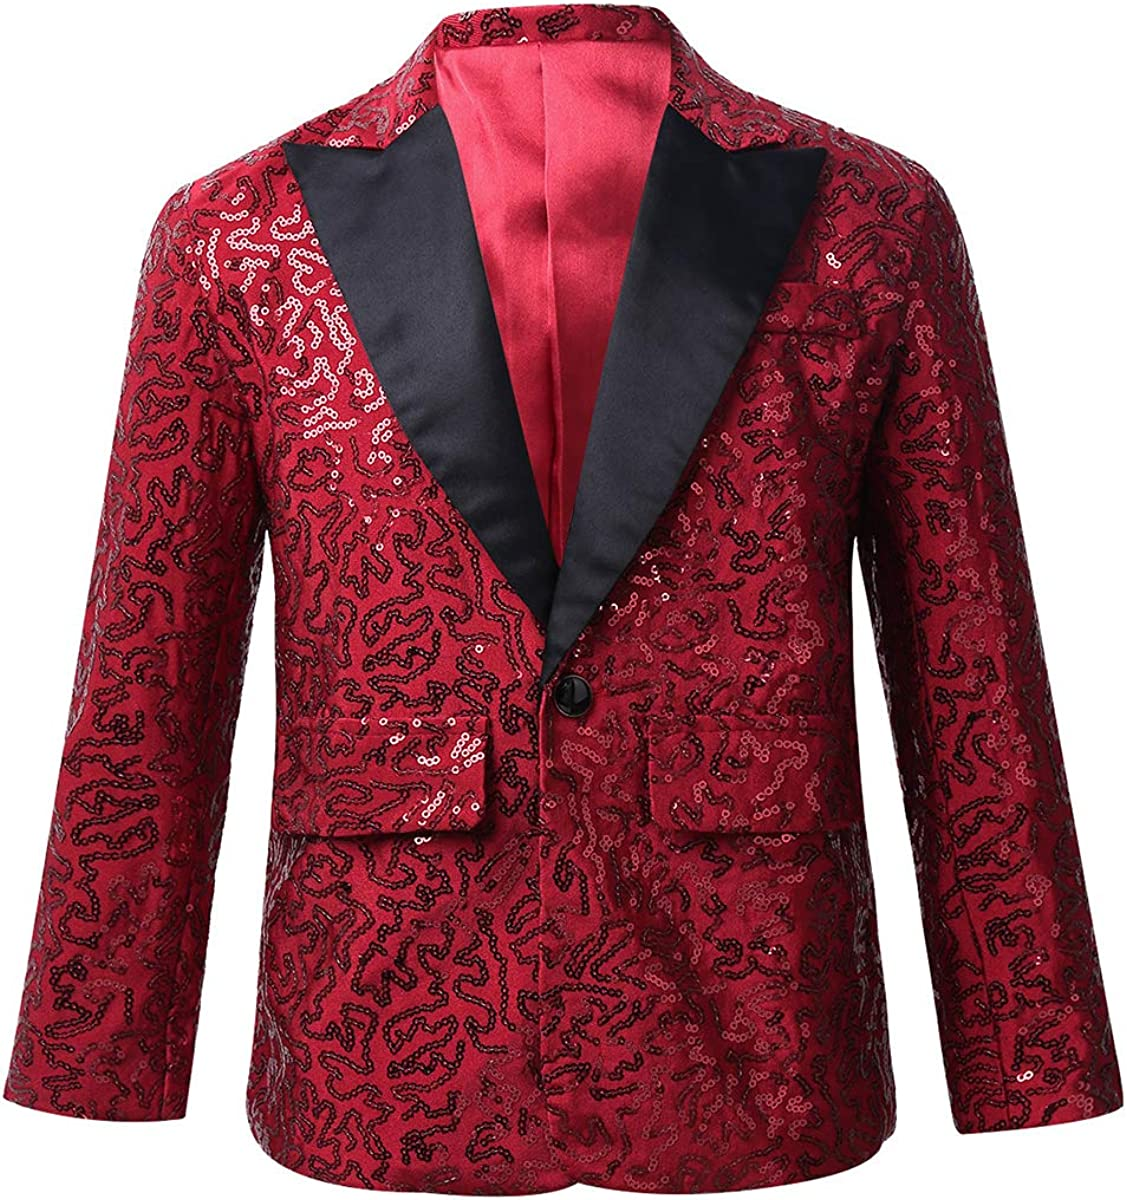 TiaoBug Boys' Classic Blazer Jacket Sequins Lapel One Button Coat Wedding Banquet Birthday Party Tuxedo Formal Suit Set